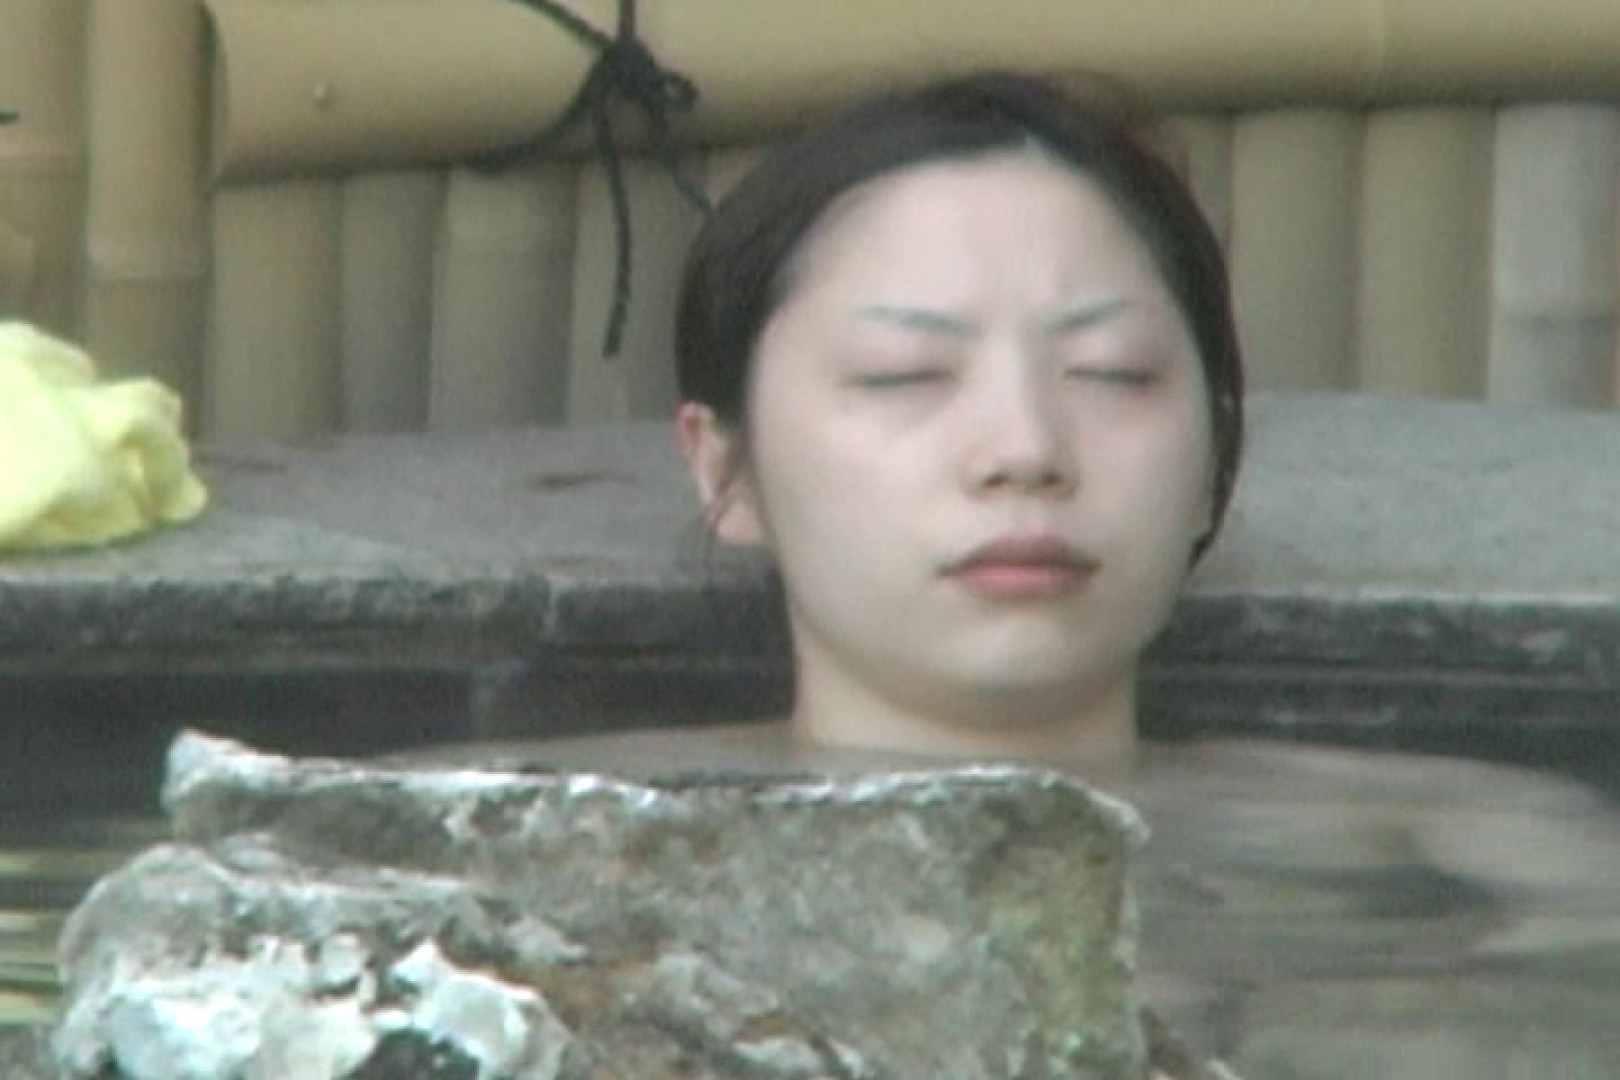 Aquaな露天風呂Vol.596 露天 覗きおまんこ画像 77画像 44